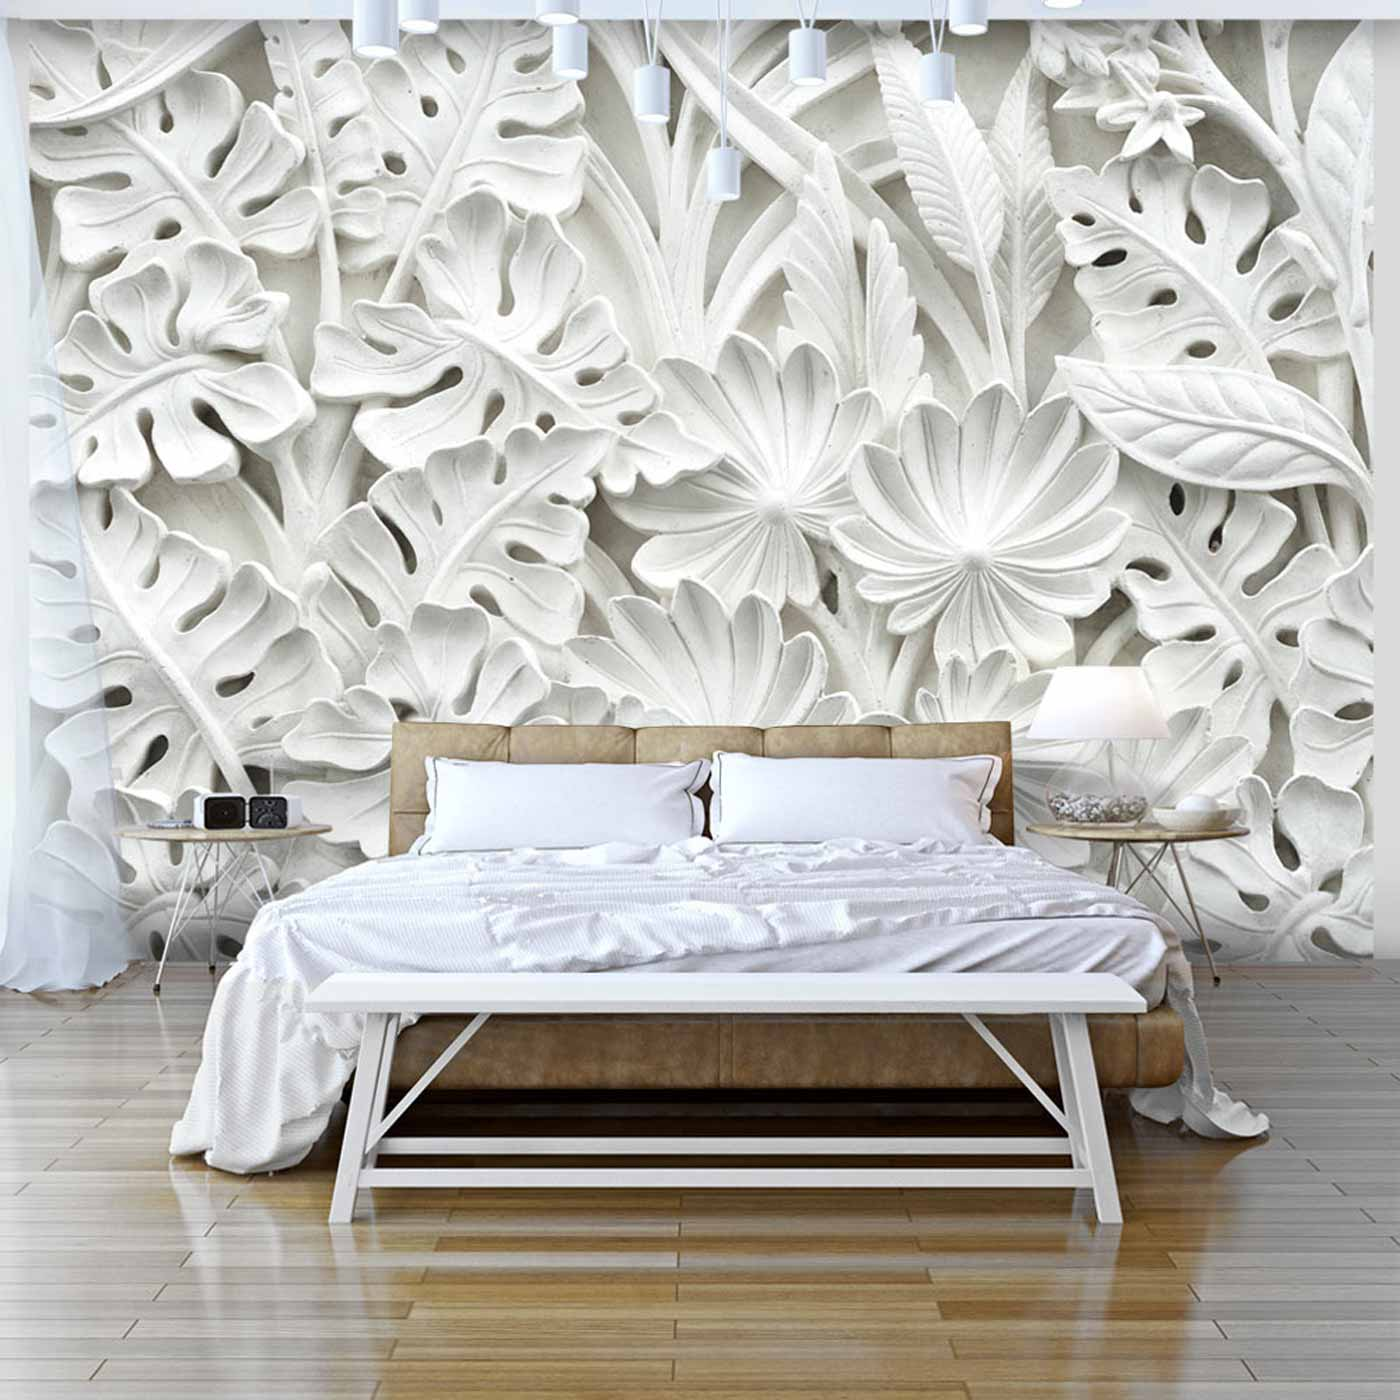 artgeist – Artgeist alabaster garden fototapet - hvid print (105x150) fra boboonline.dk